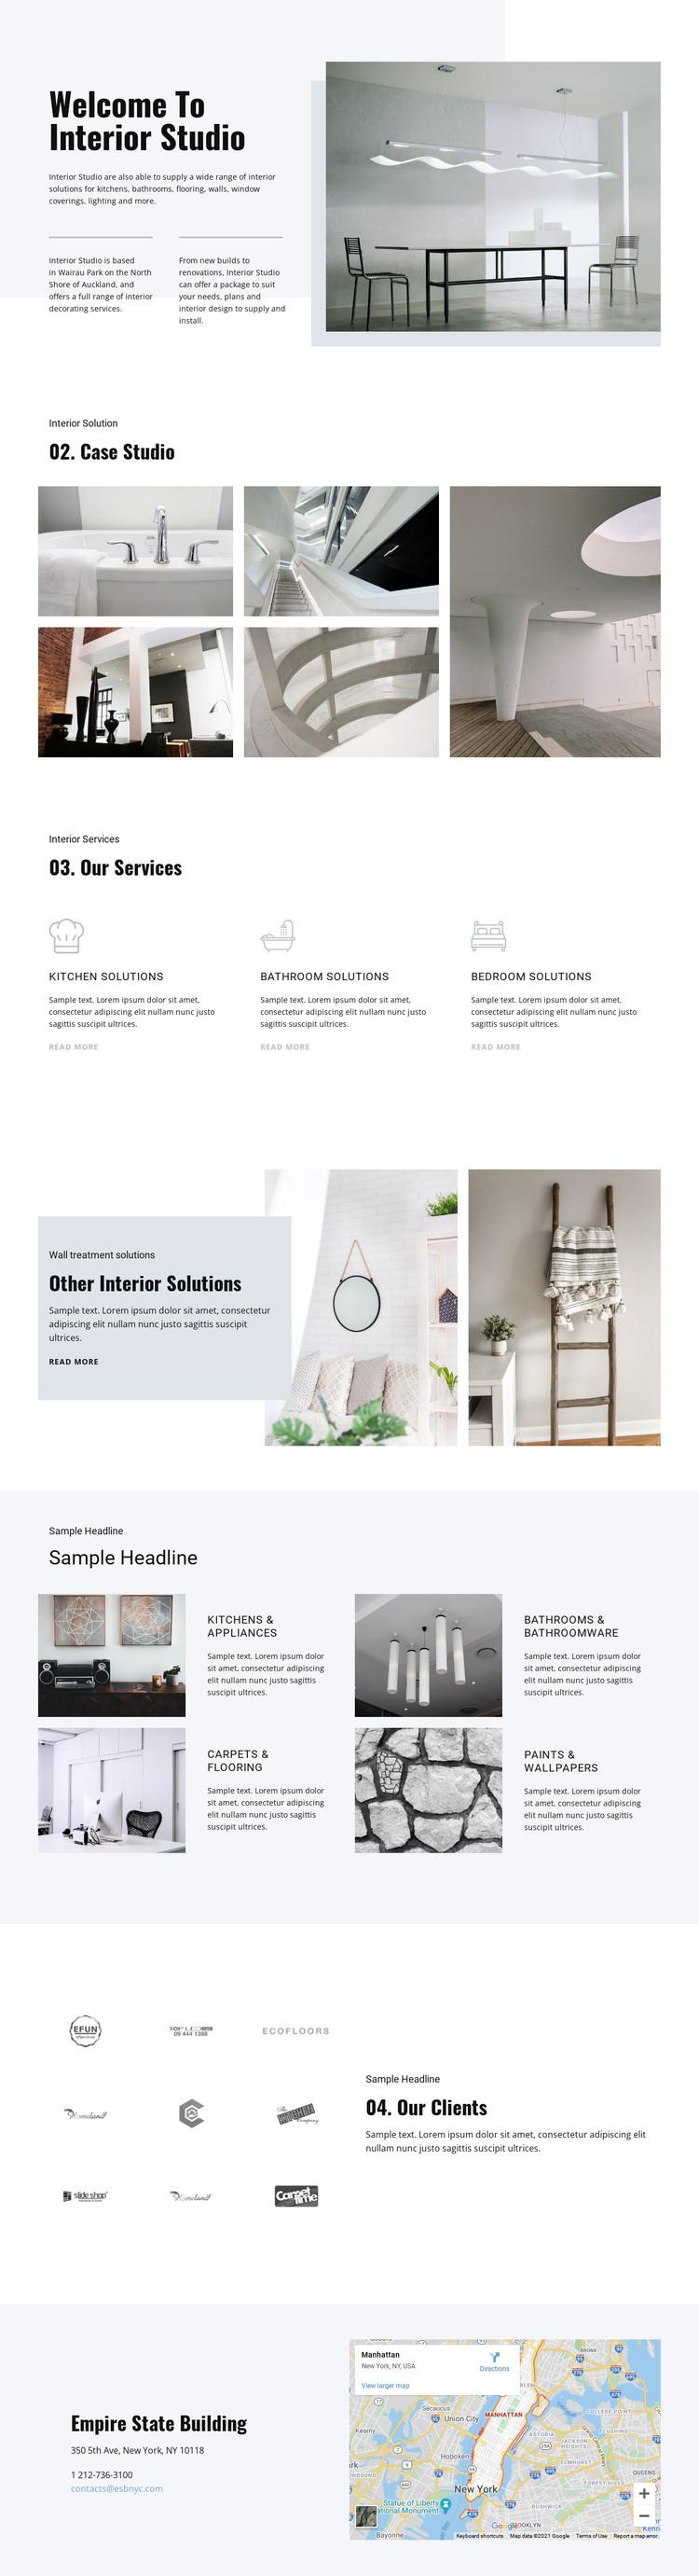 Welcome to interior studio Web Design